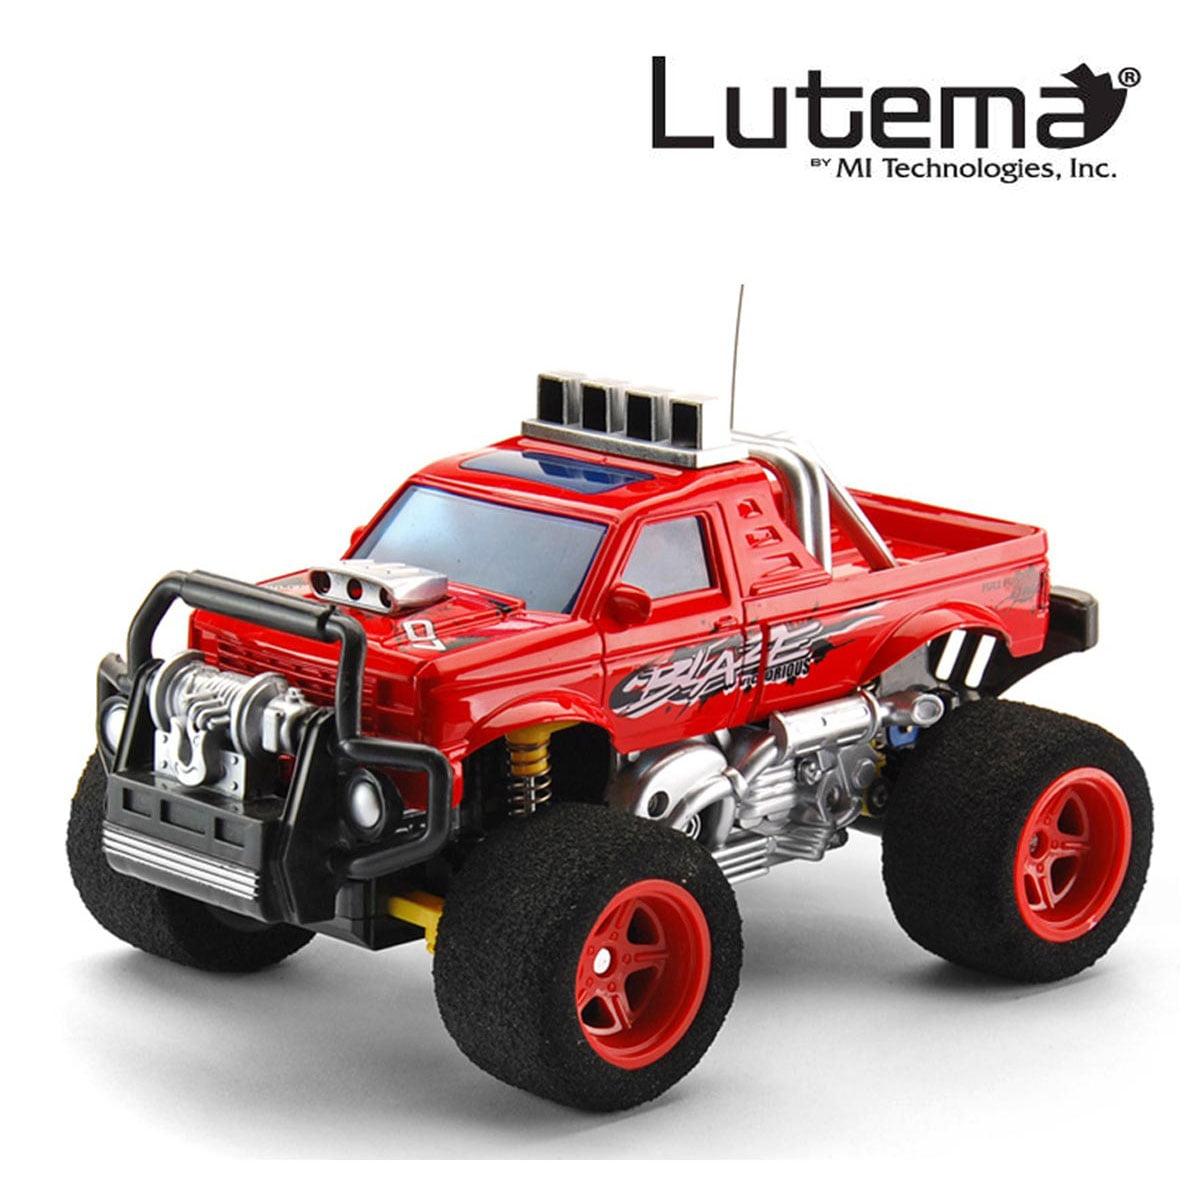 Lutema Blaze Truck 4CH Remote Control Truck